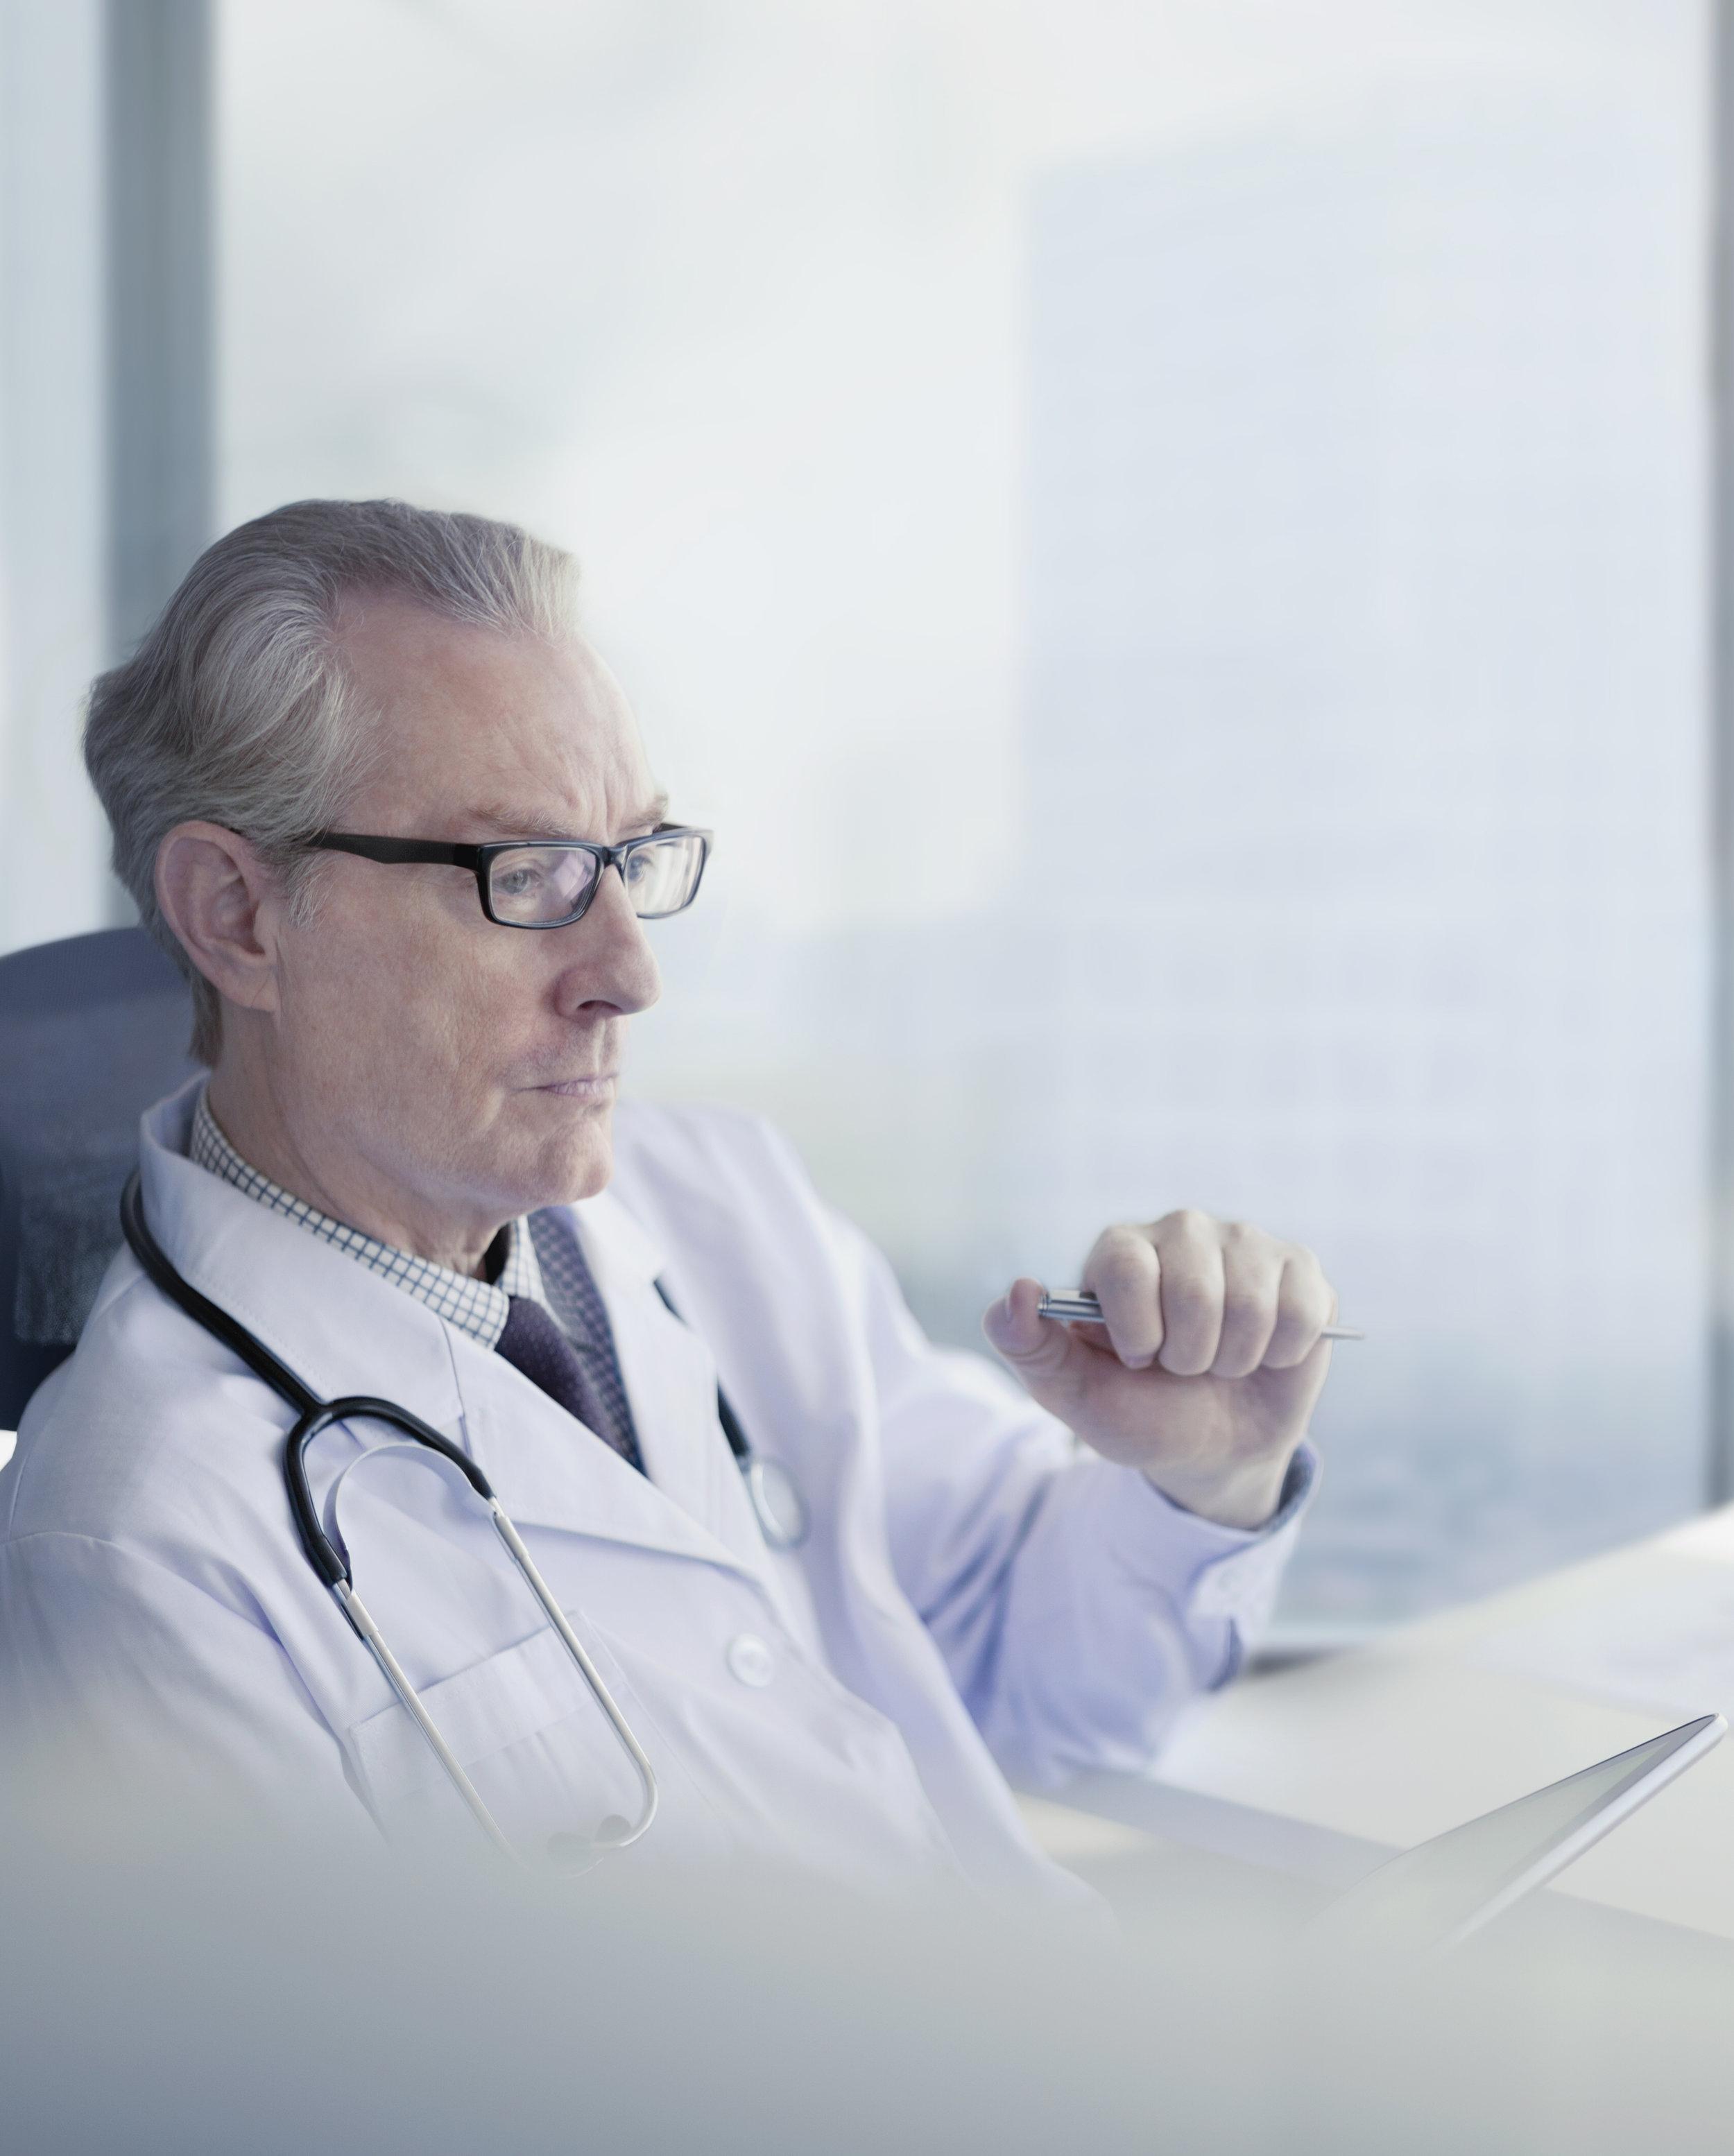 Thinking doctor.jpg